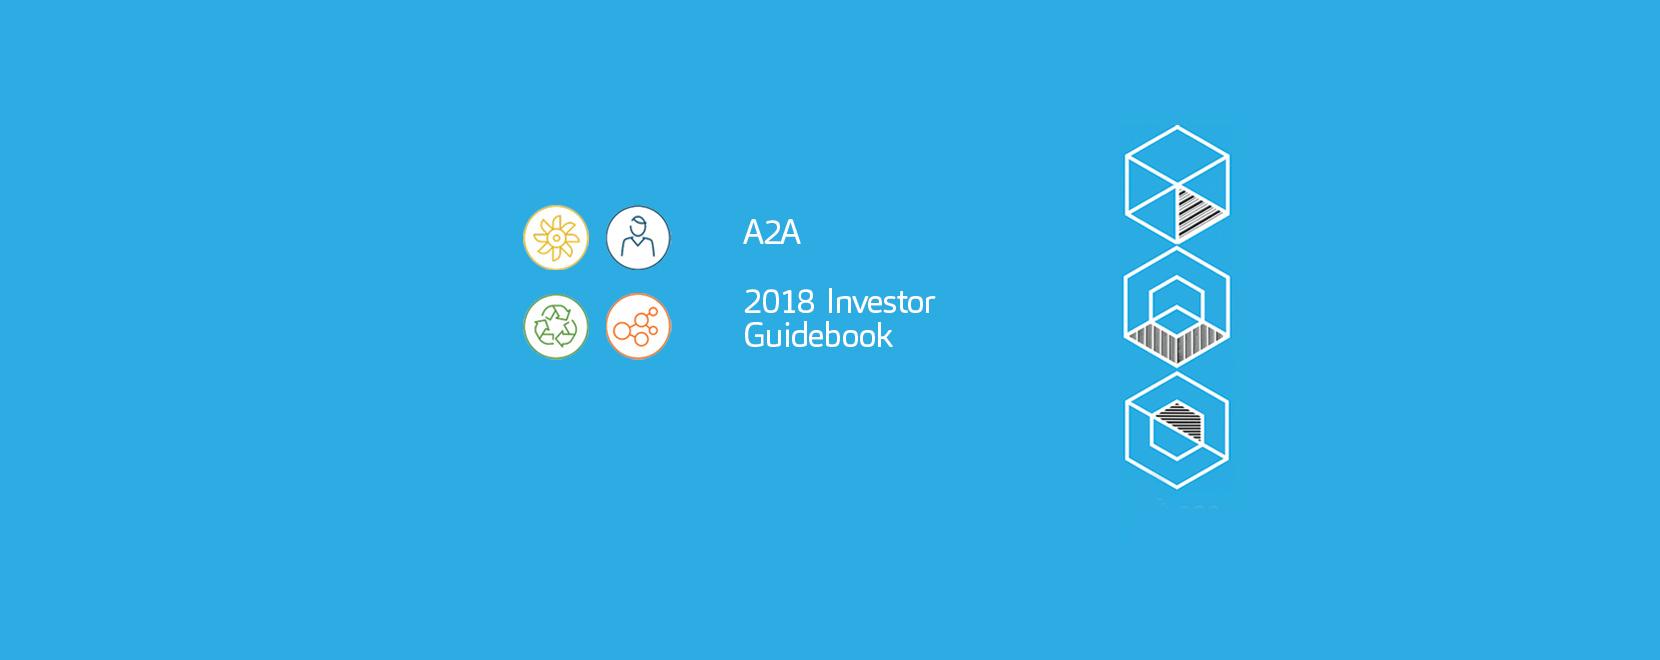 A2A 2018 Investor Guidebook